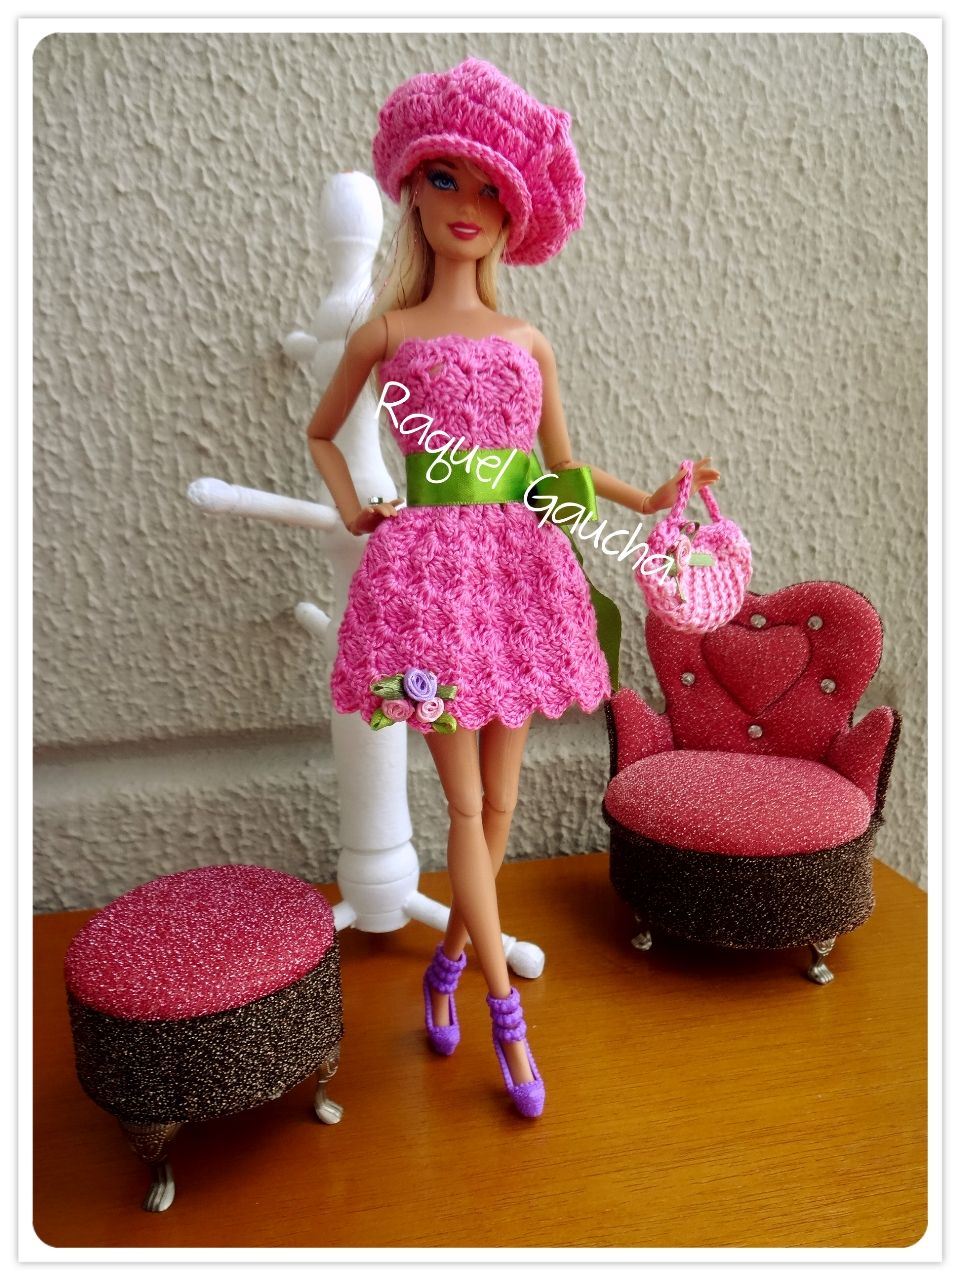 #Barbie #Doll #Cléa5 #Muñeca #Crochet #Vestido #Dress #Purse #Bolsa #Boina #RaquelGaucha